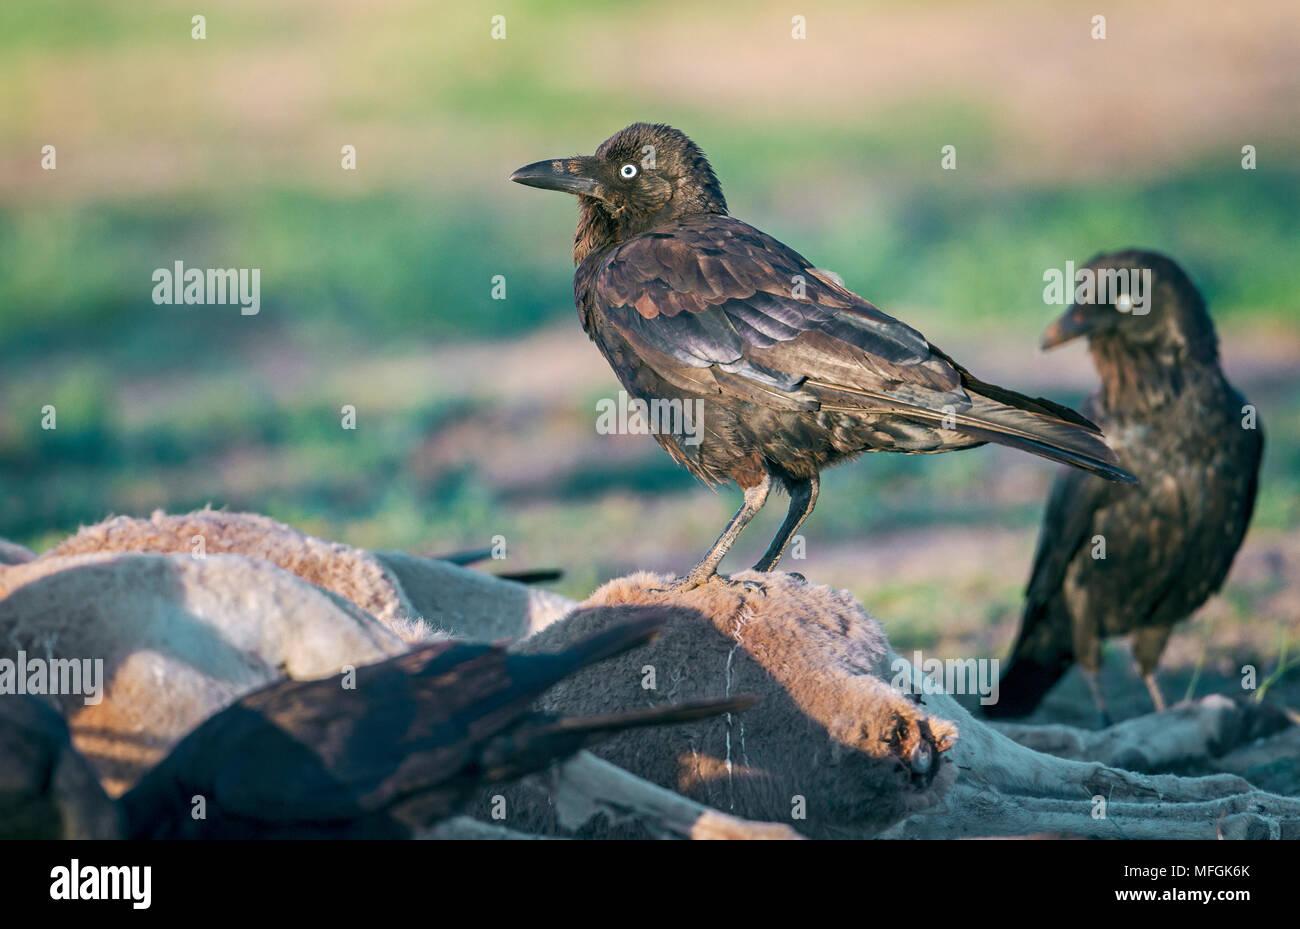 Australian Raven (Corvus coronoides), Fam. Corvidae, feeding on kangaroo carcass, Mulyangarie Station, South Australia, Australia - Stock Image